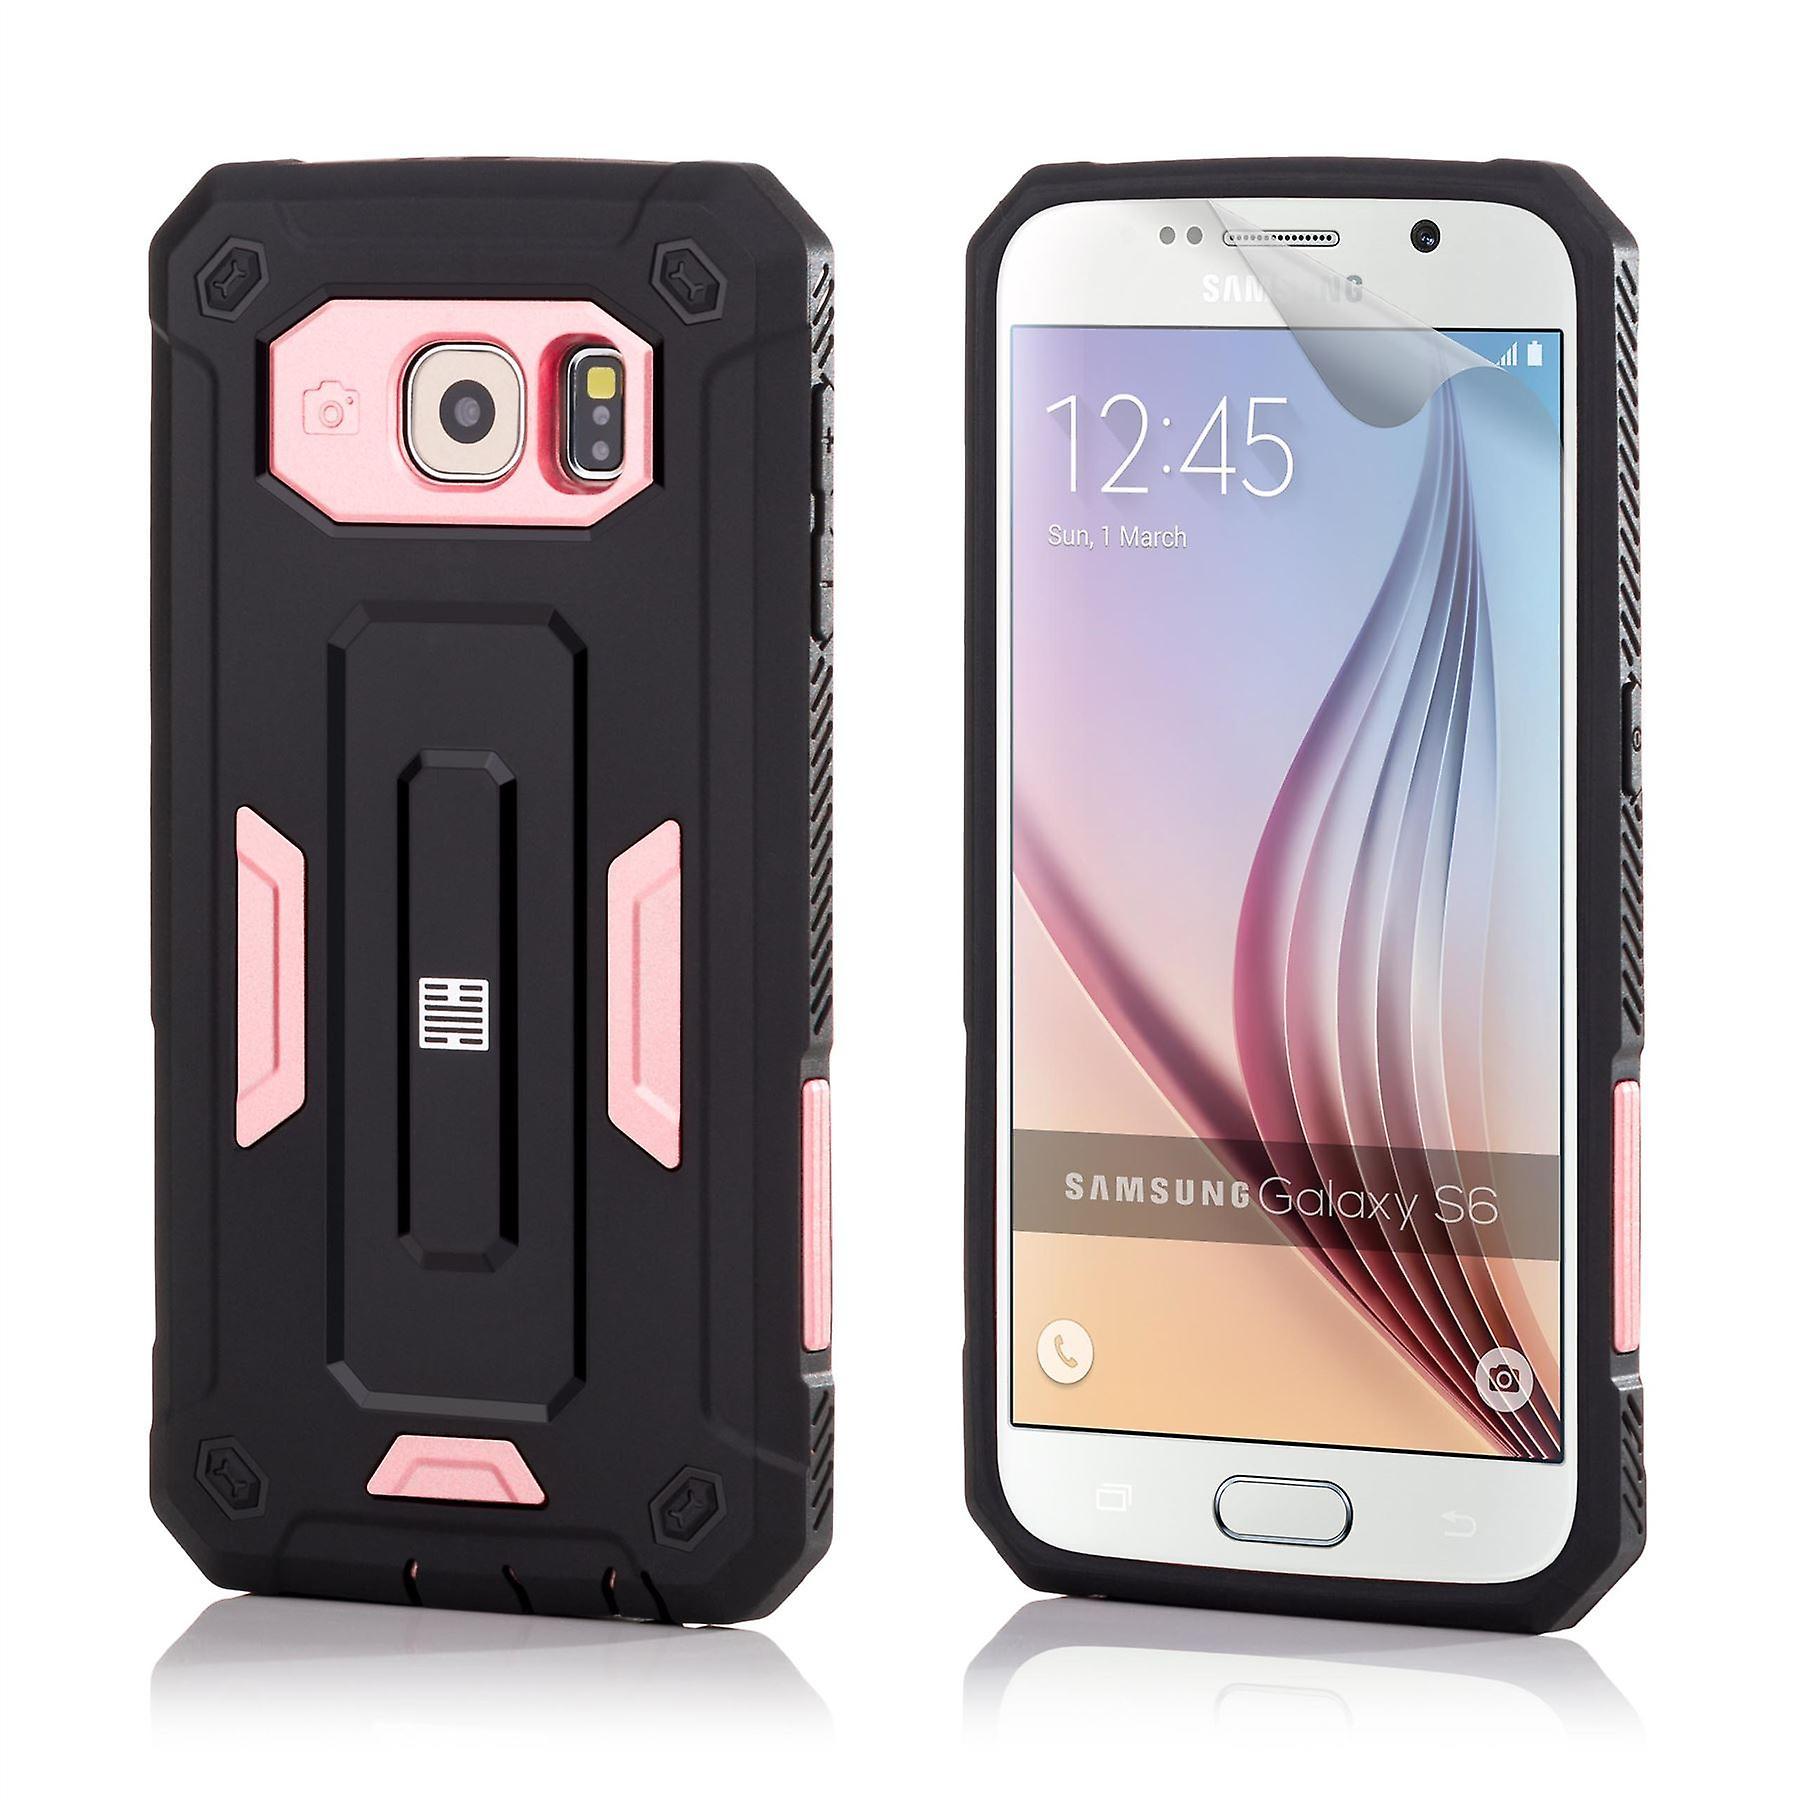 32nd Hard Defender case for Samsung Galaxy S6 (SM-G920) - Rose Gold